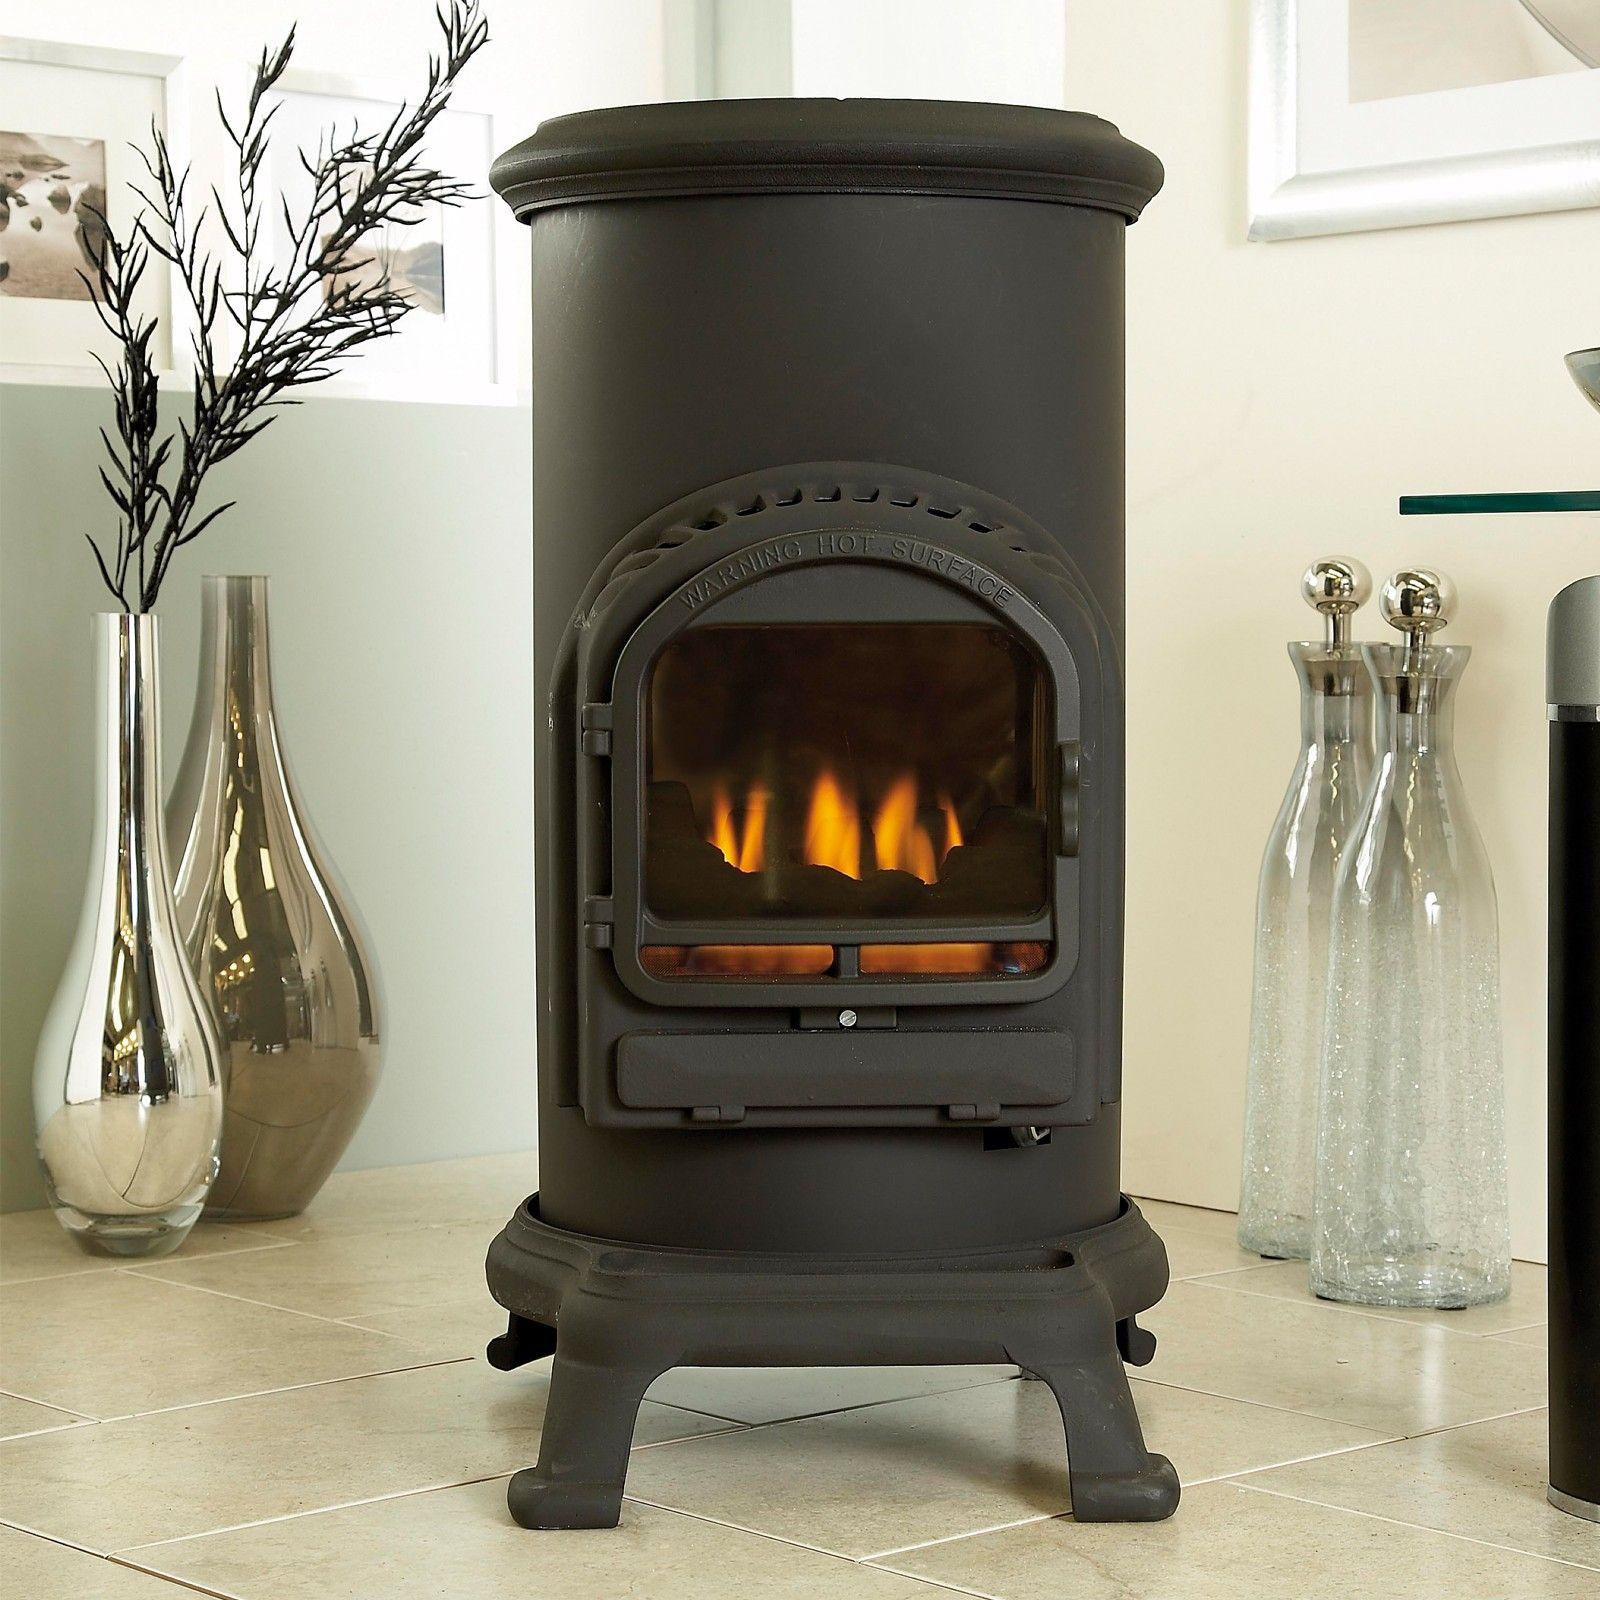 Portable Gas Fireplace Heater Fireplace Pinterest Fireplace Heater Gas Fireplace And